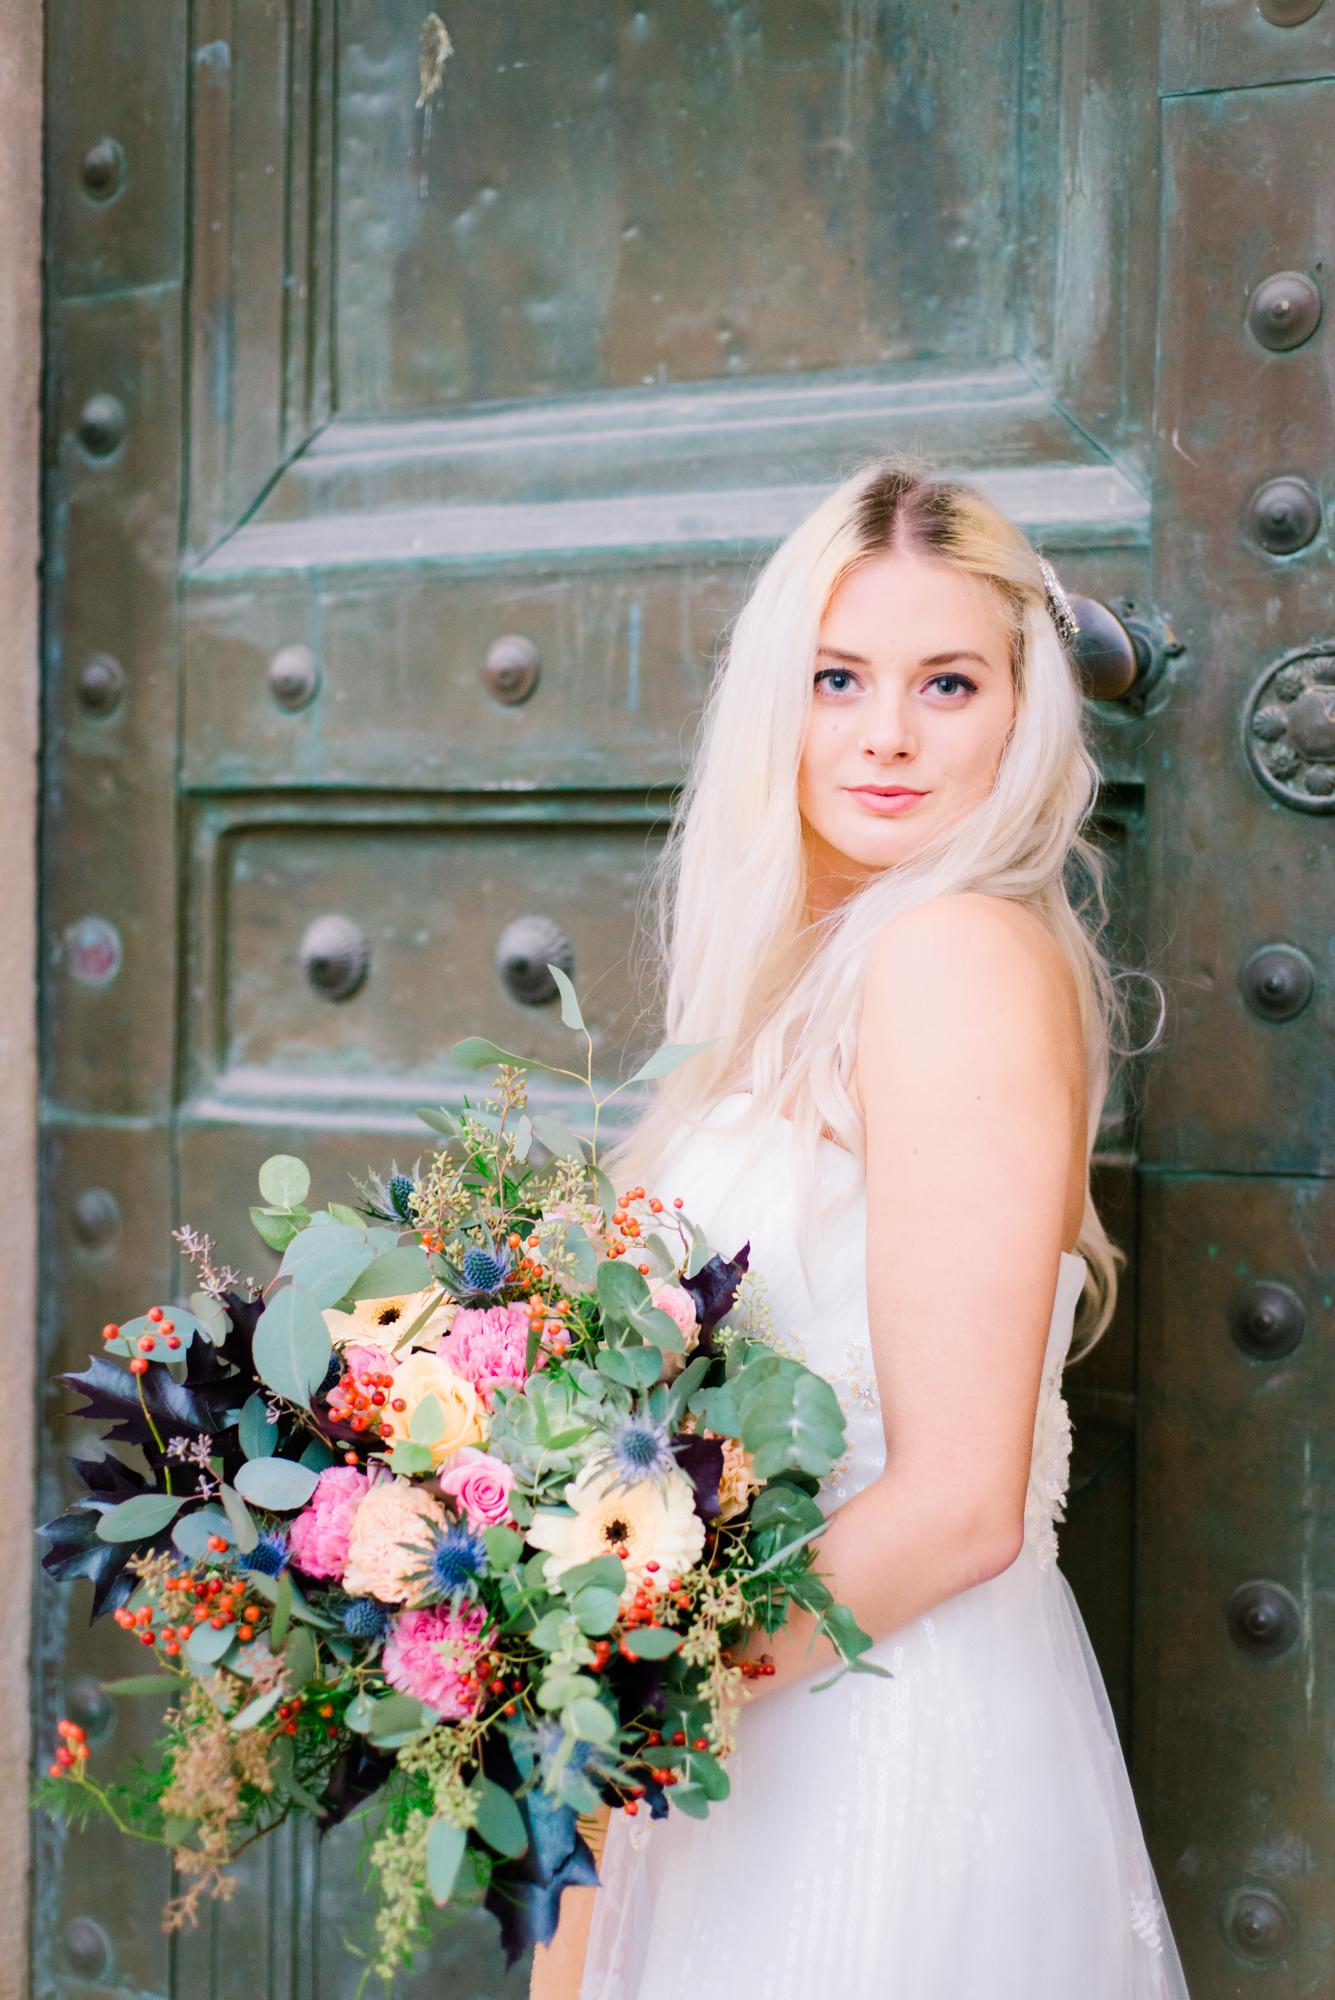 Elegant Organic Fall Swedish Bridal Wedding Styled Shoot - Erika Alvarenga Photography-60.jpg